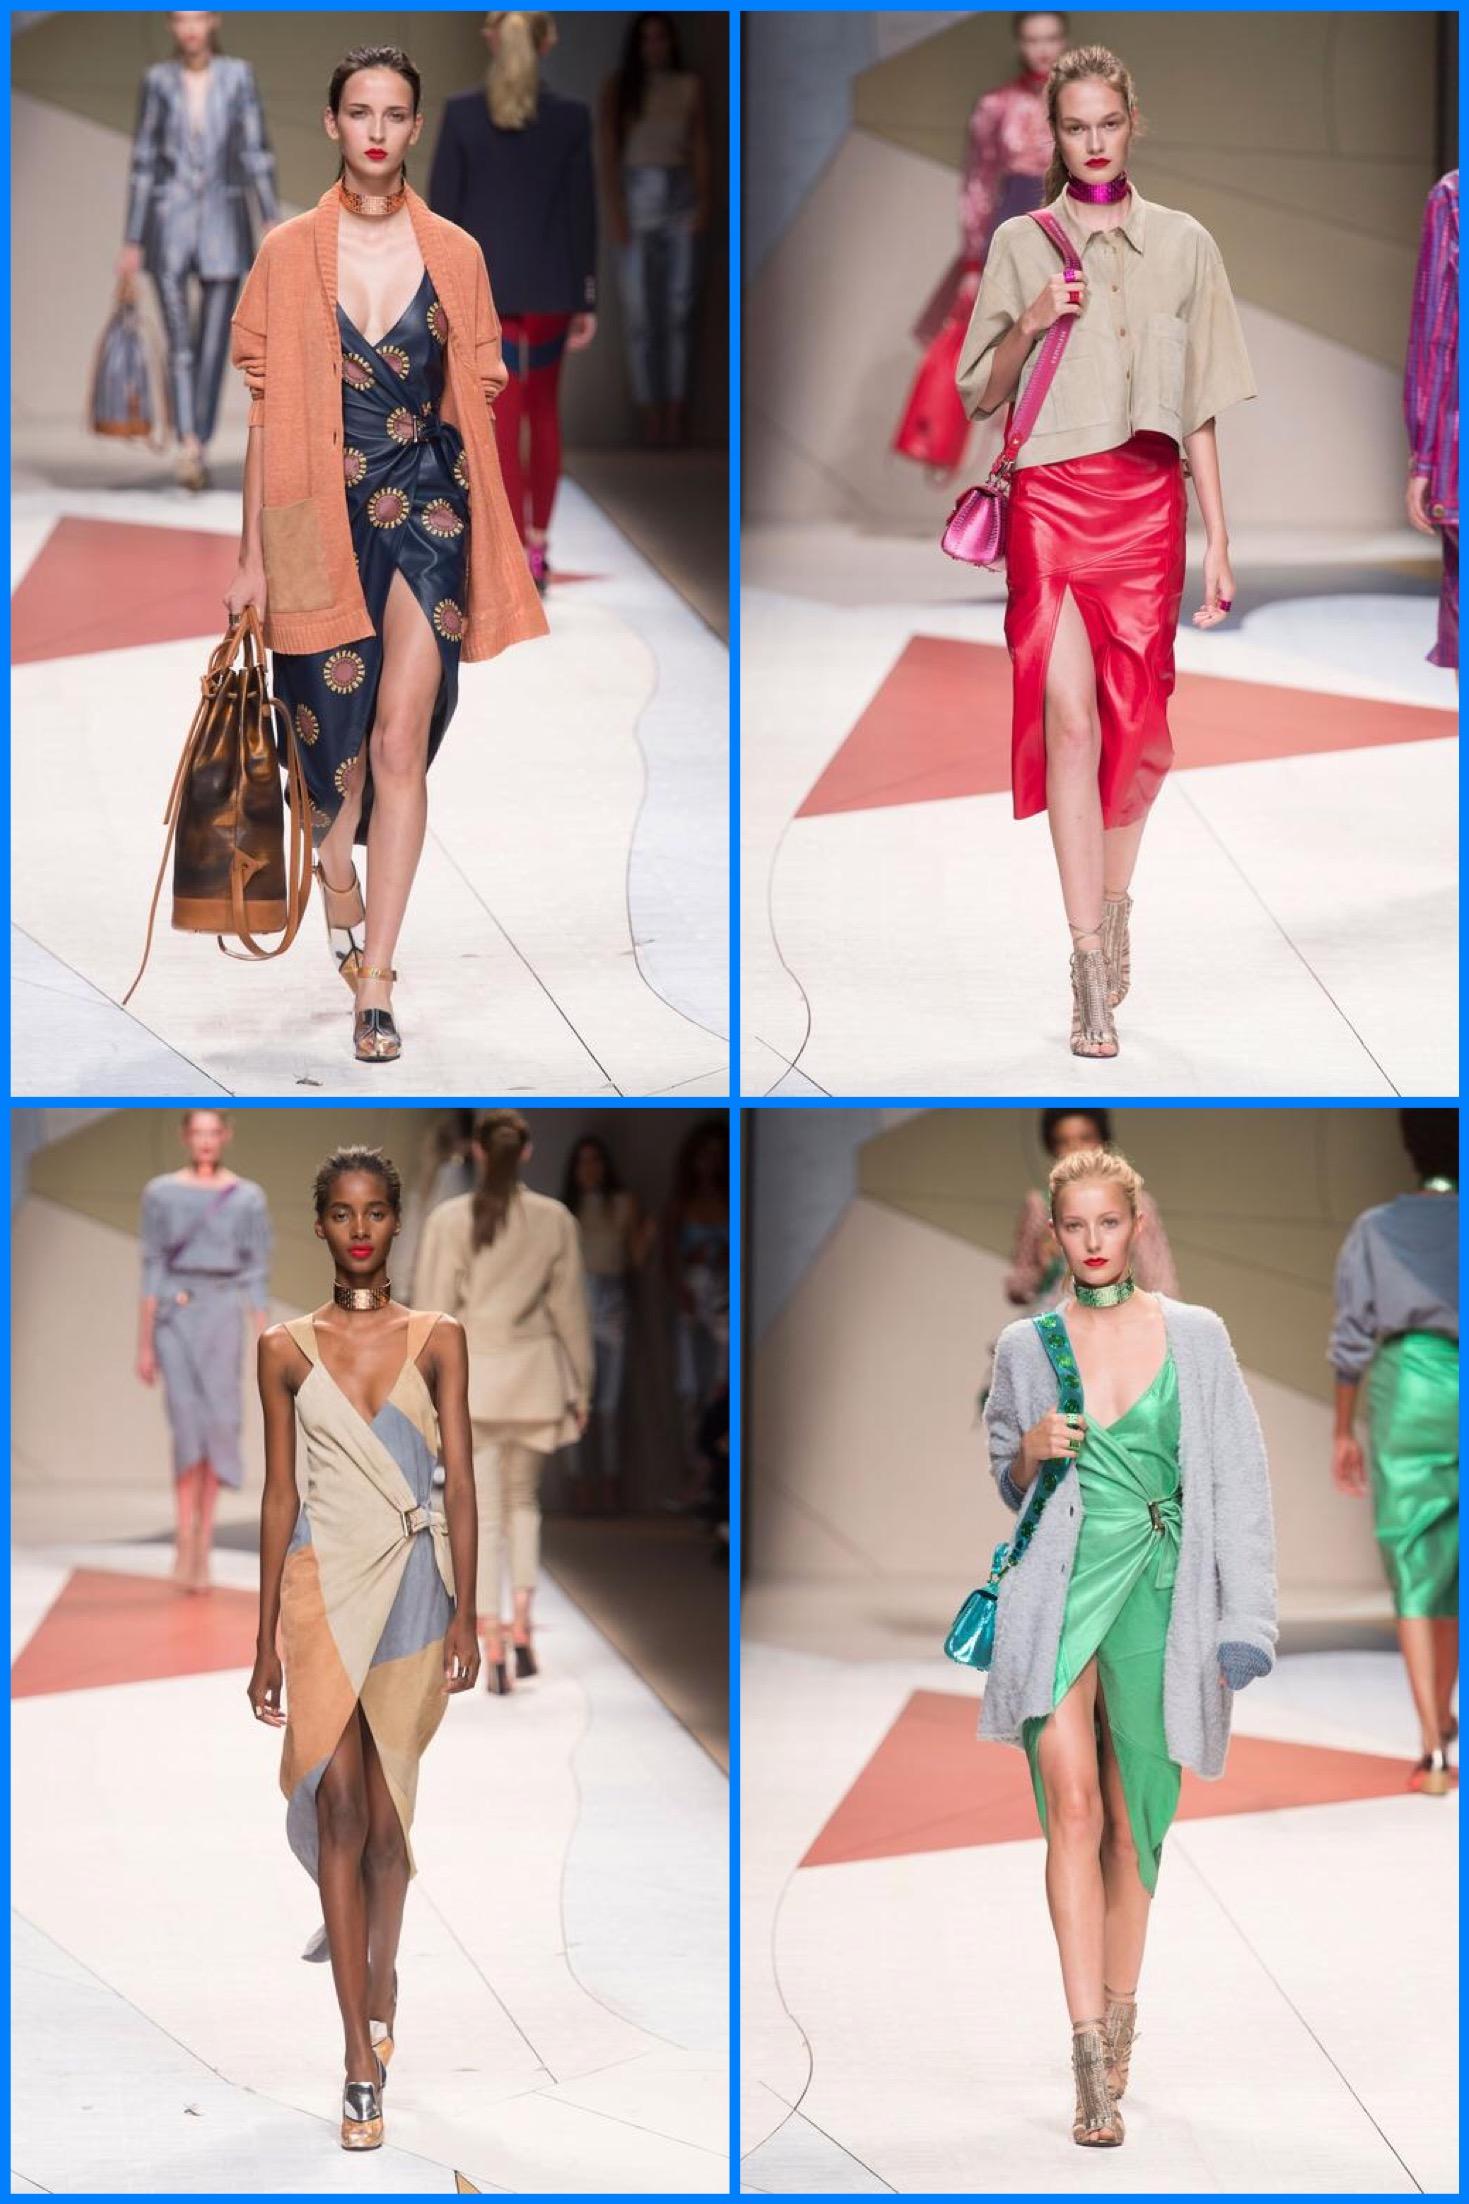 milano-fashion-week-pret-a-porter-spring-summer-2017-style-trussardi